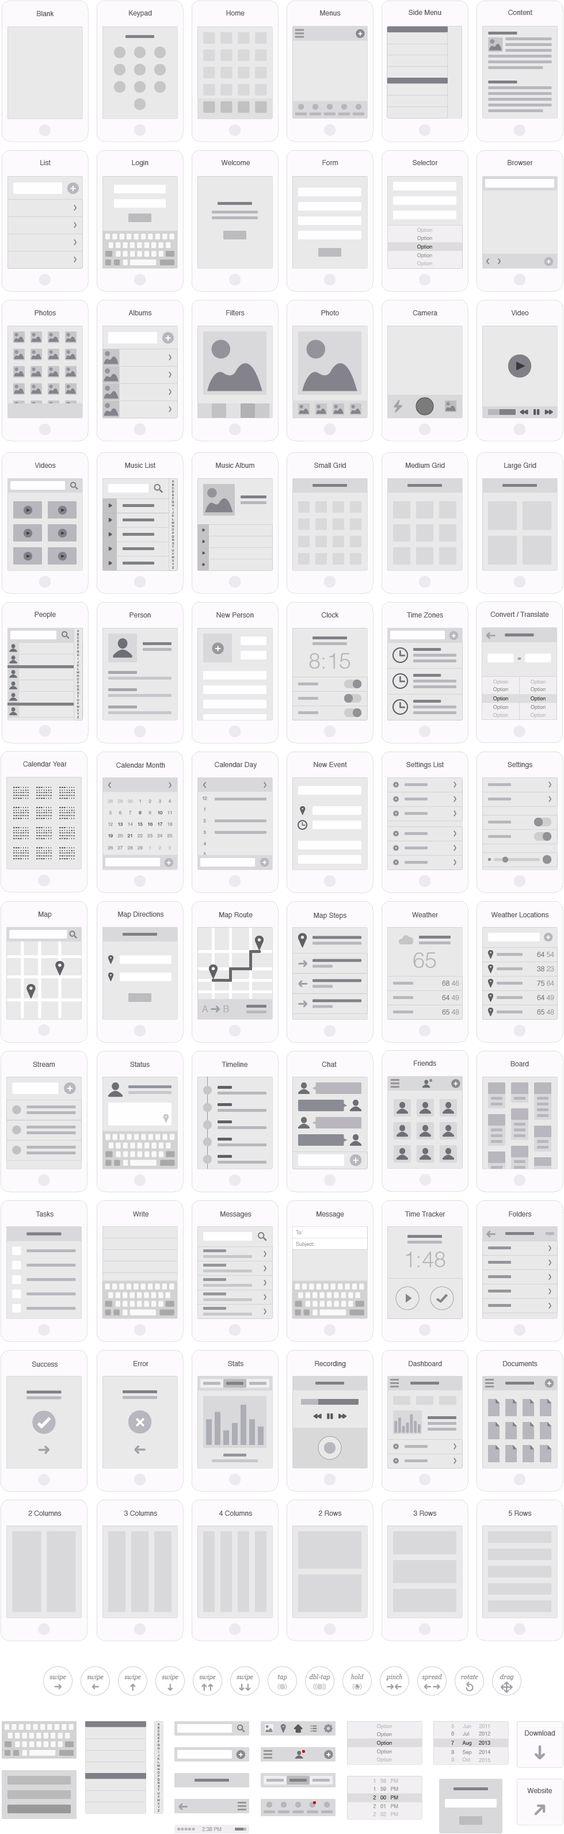 Mobile app visual flowchart illustrator template ux kits ux mobile app visual flowchart illustrator template ux kits ux webdesign uxui pinterest flowchart mobile app and illustrators nvjuhfo Image collections